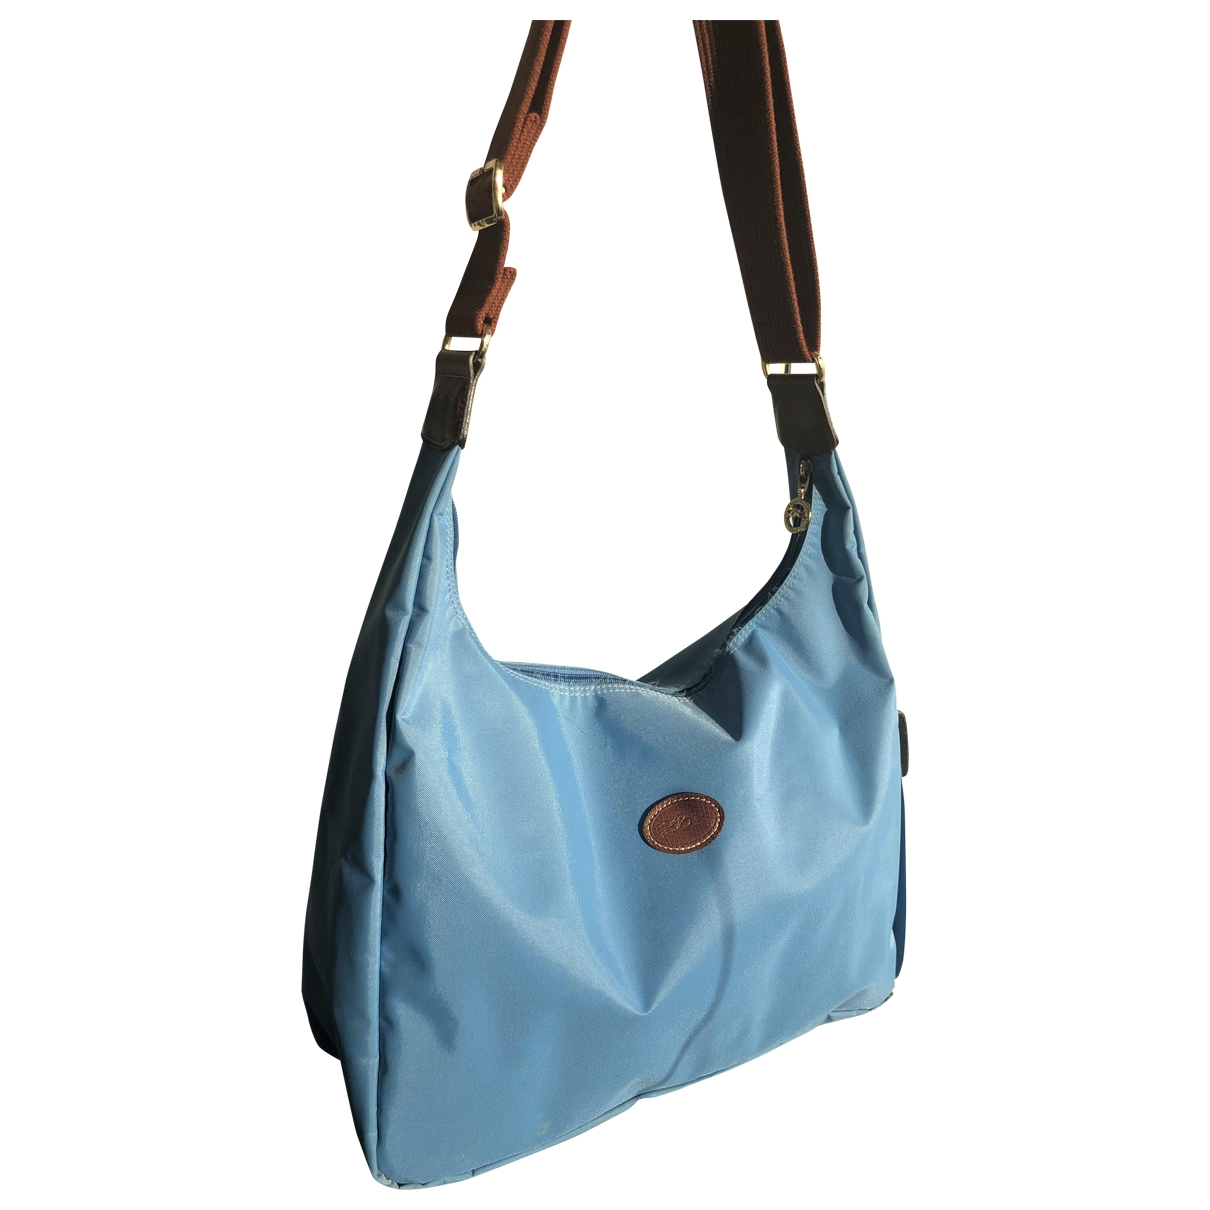 Longchamp - Sac a main Pliage  pour femme en toile - bleu